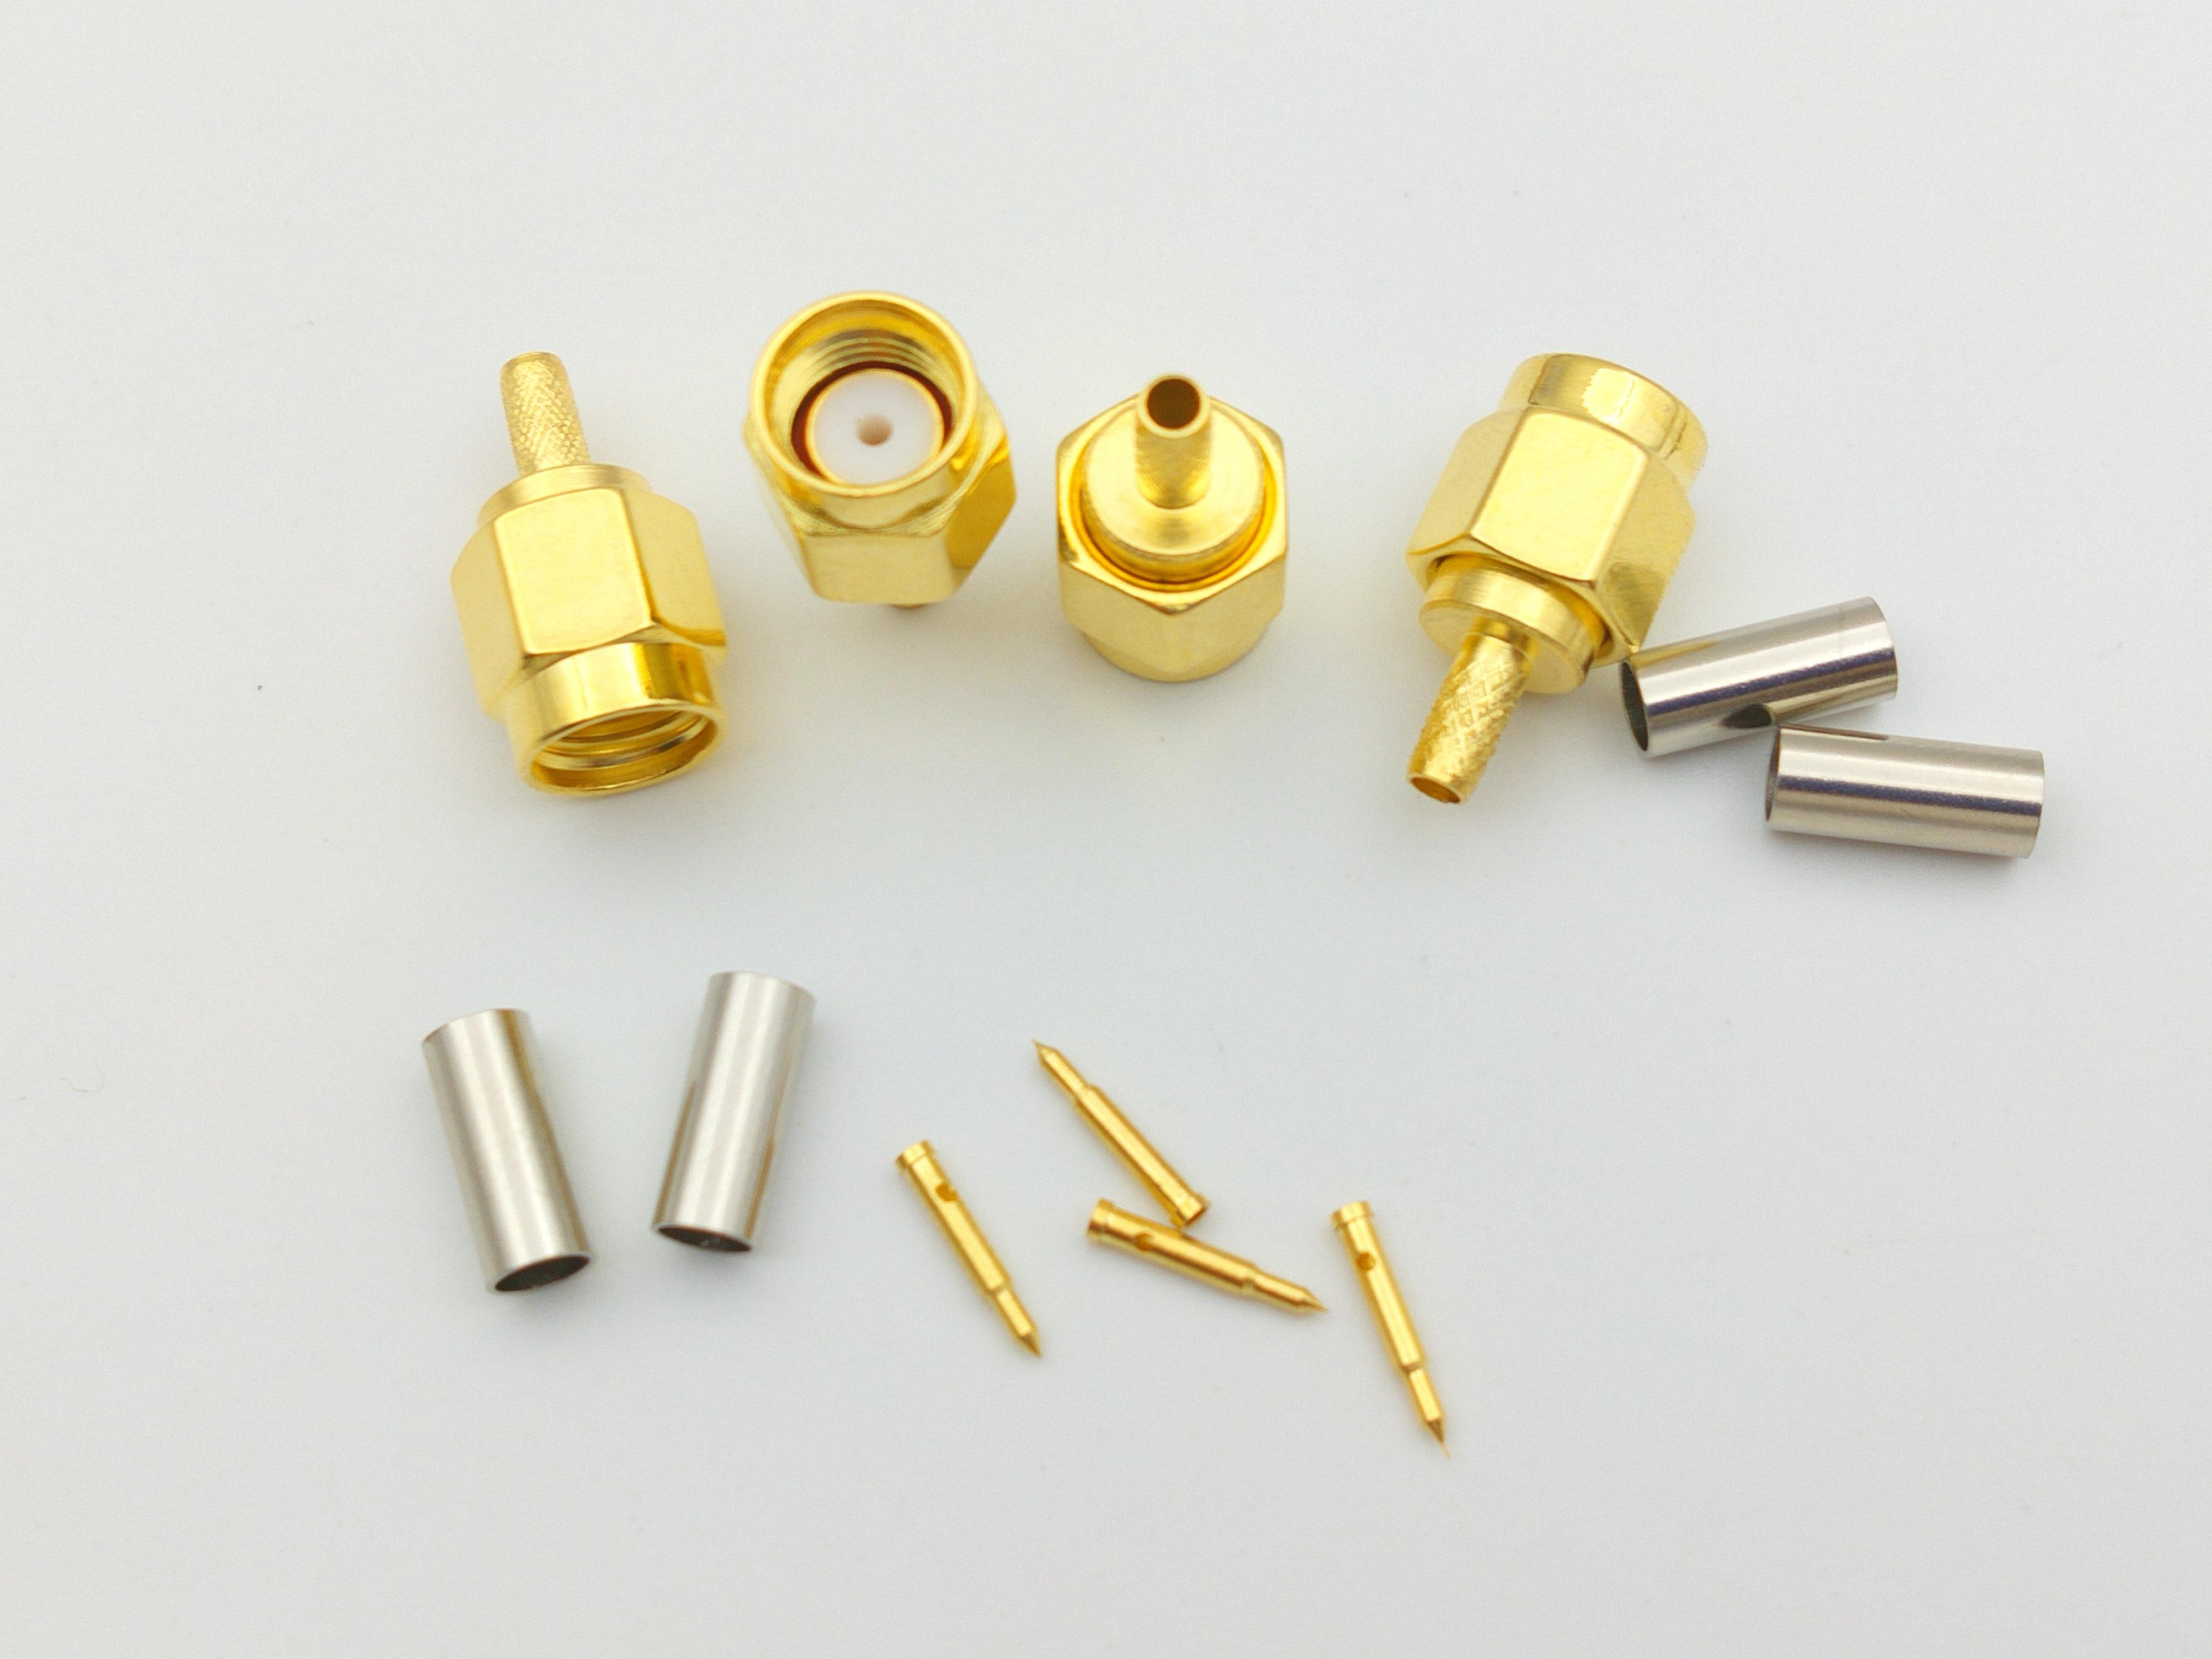 1000pcs lot SMA Plug male RF Crimp for LMR100 RG316 RG174 cable adapter connectors